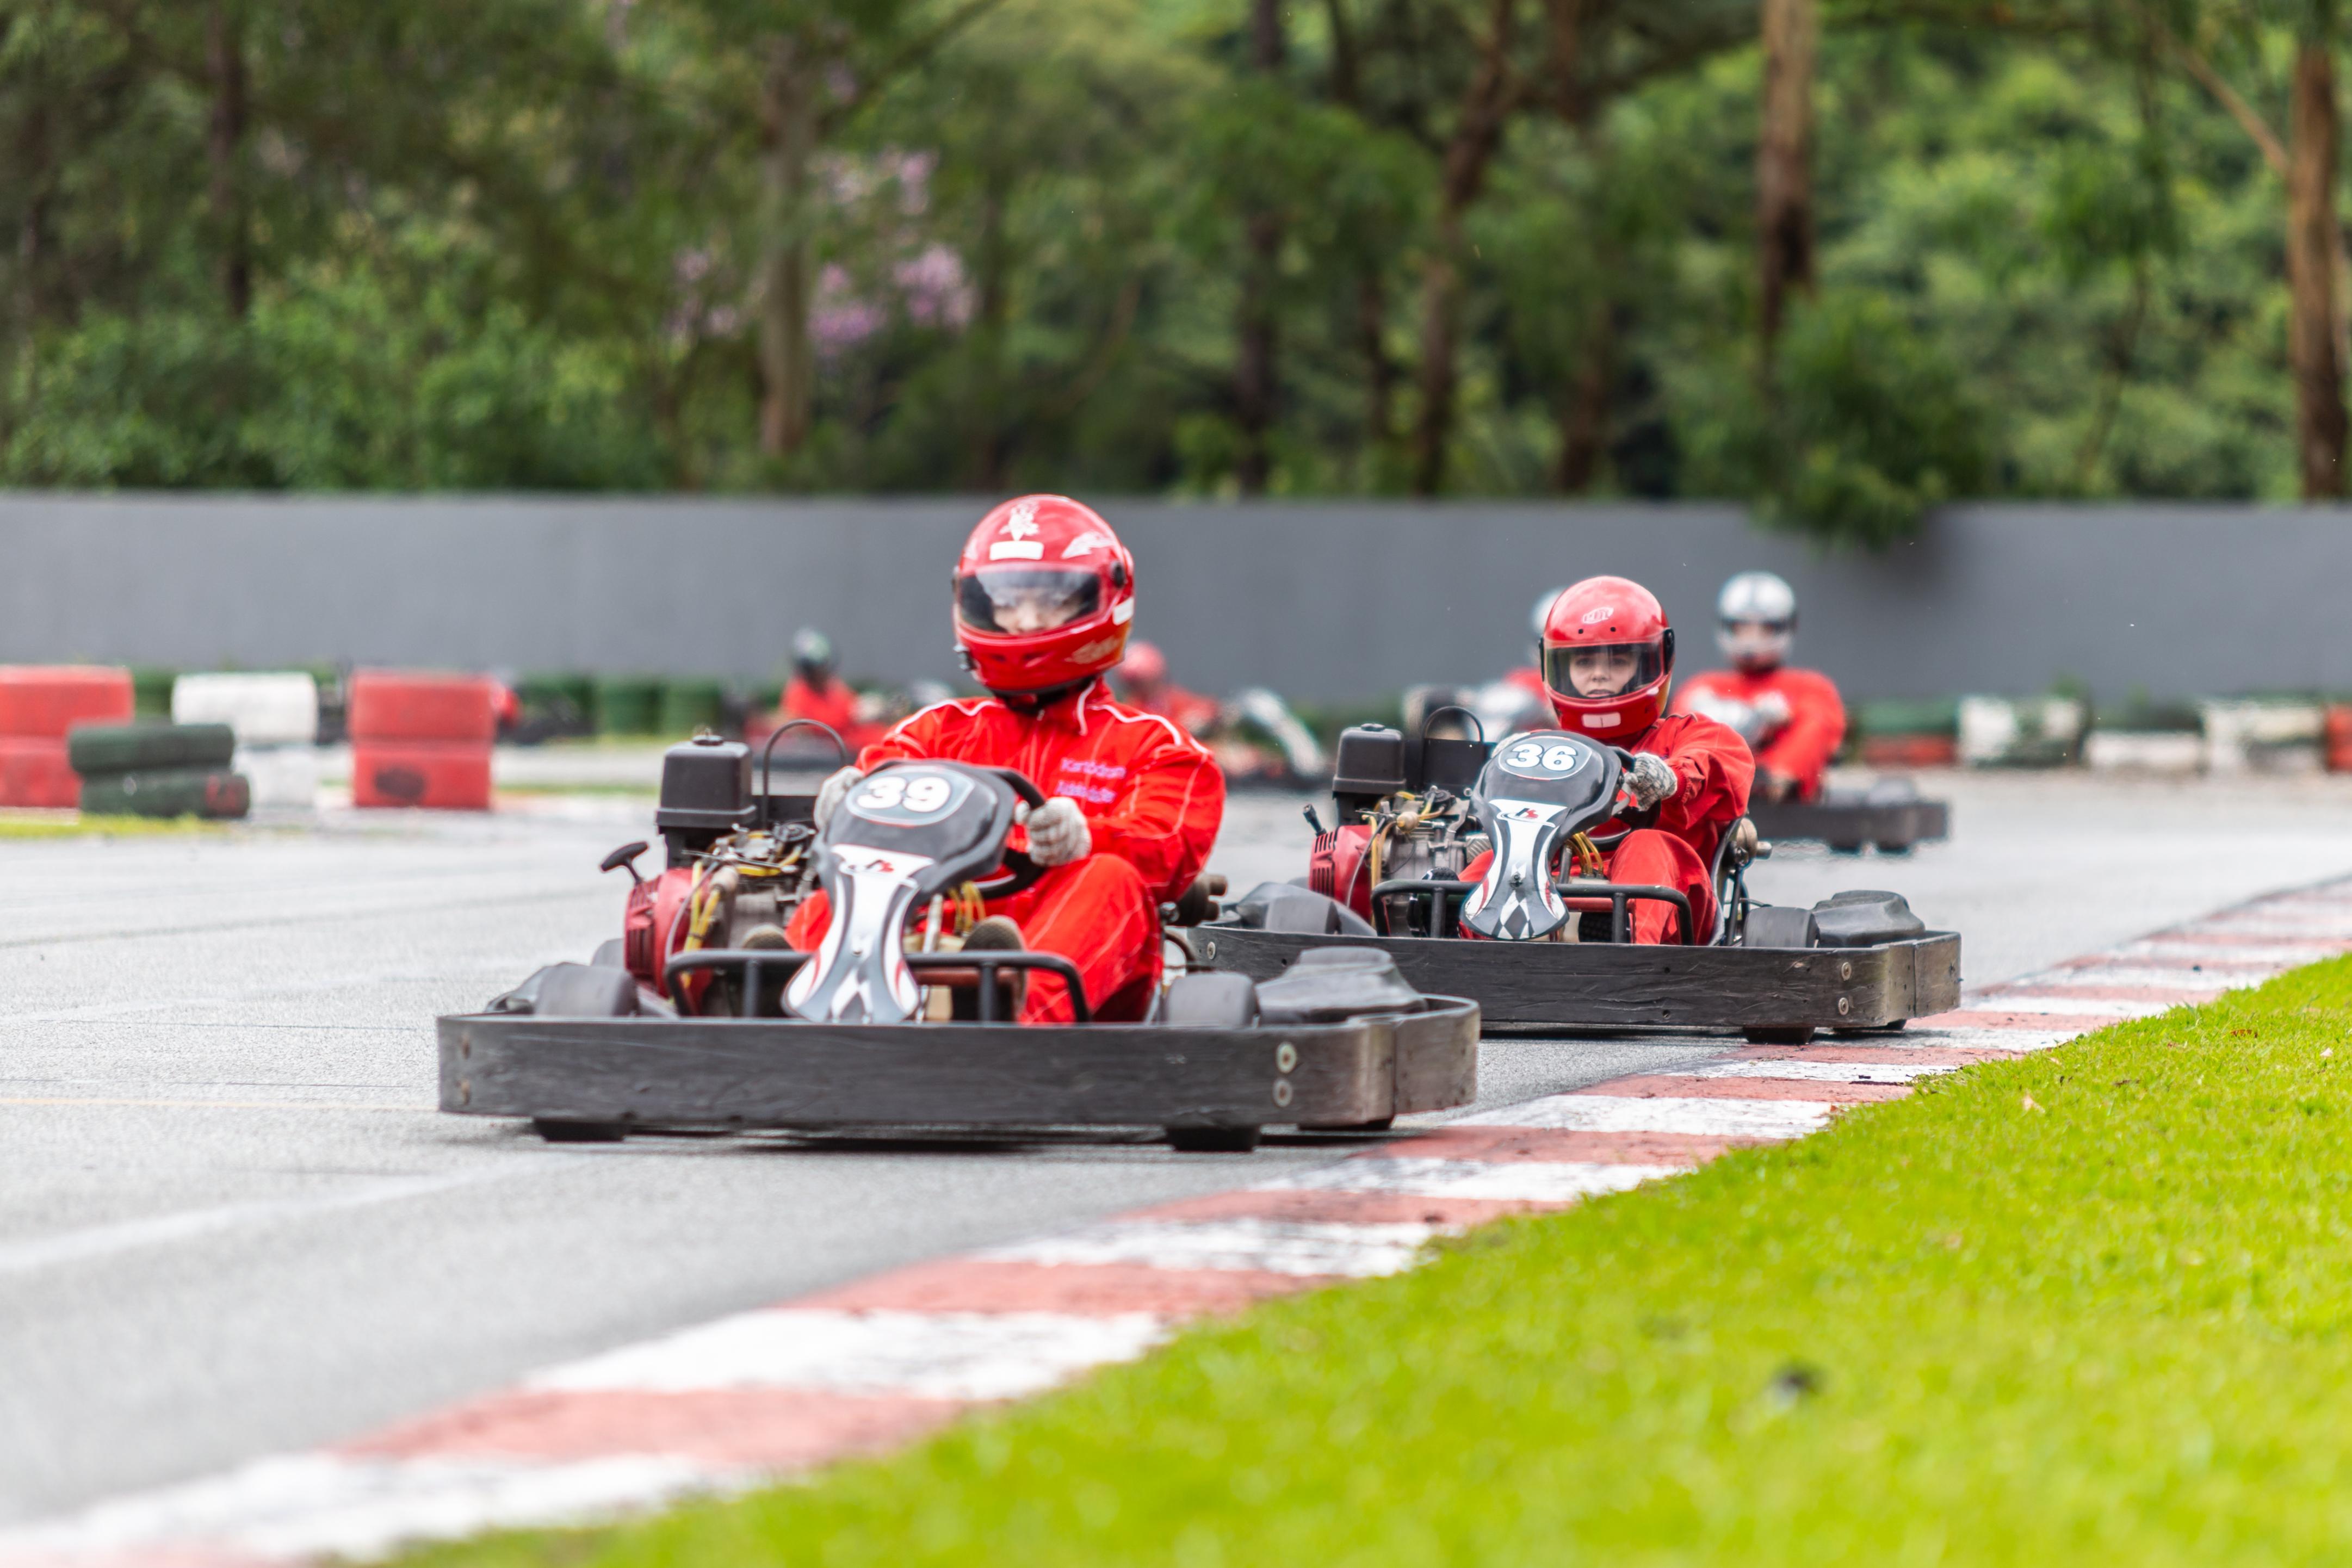 Segundo Campeonato de Kart da Kontik Viagens